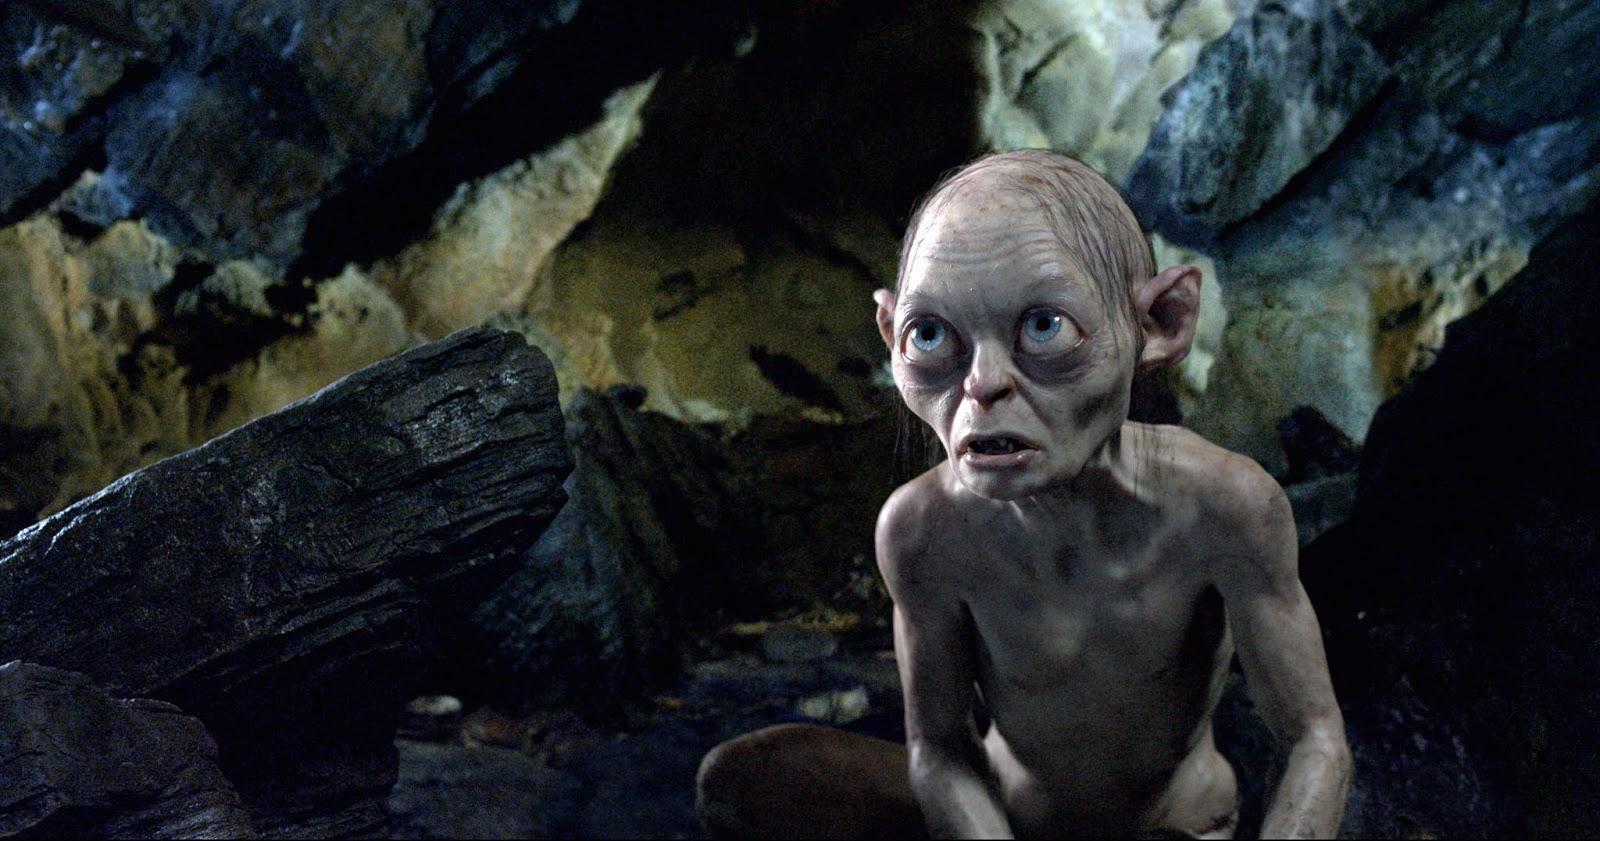 Film-Review-The-Hobbit.JPEG.jpg